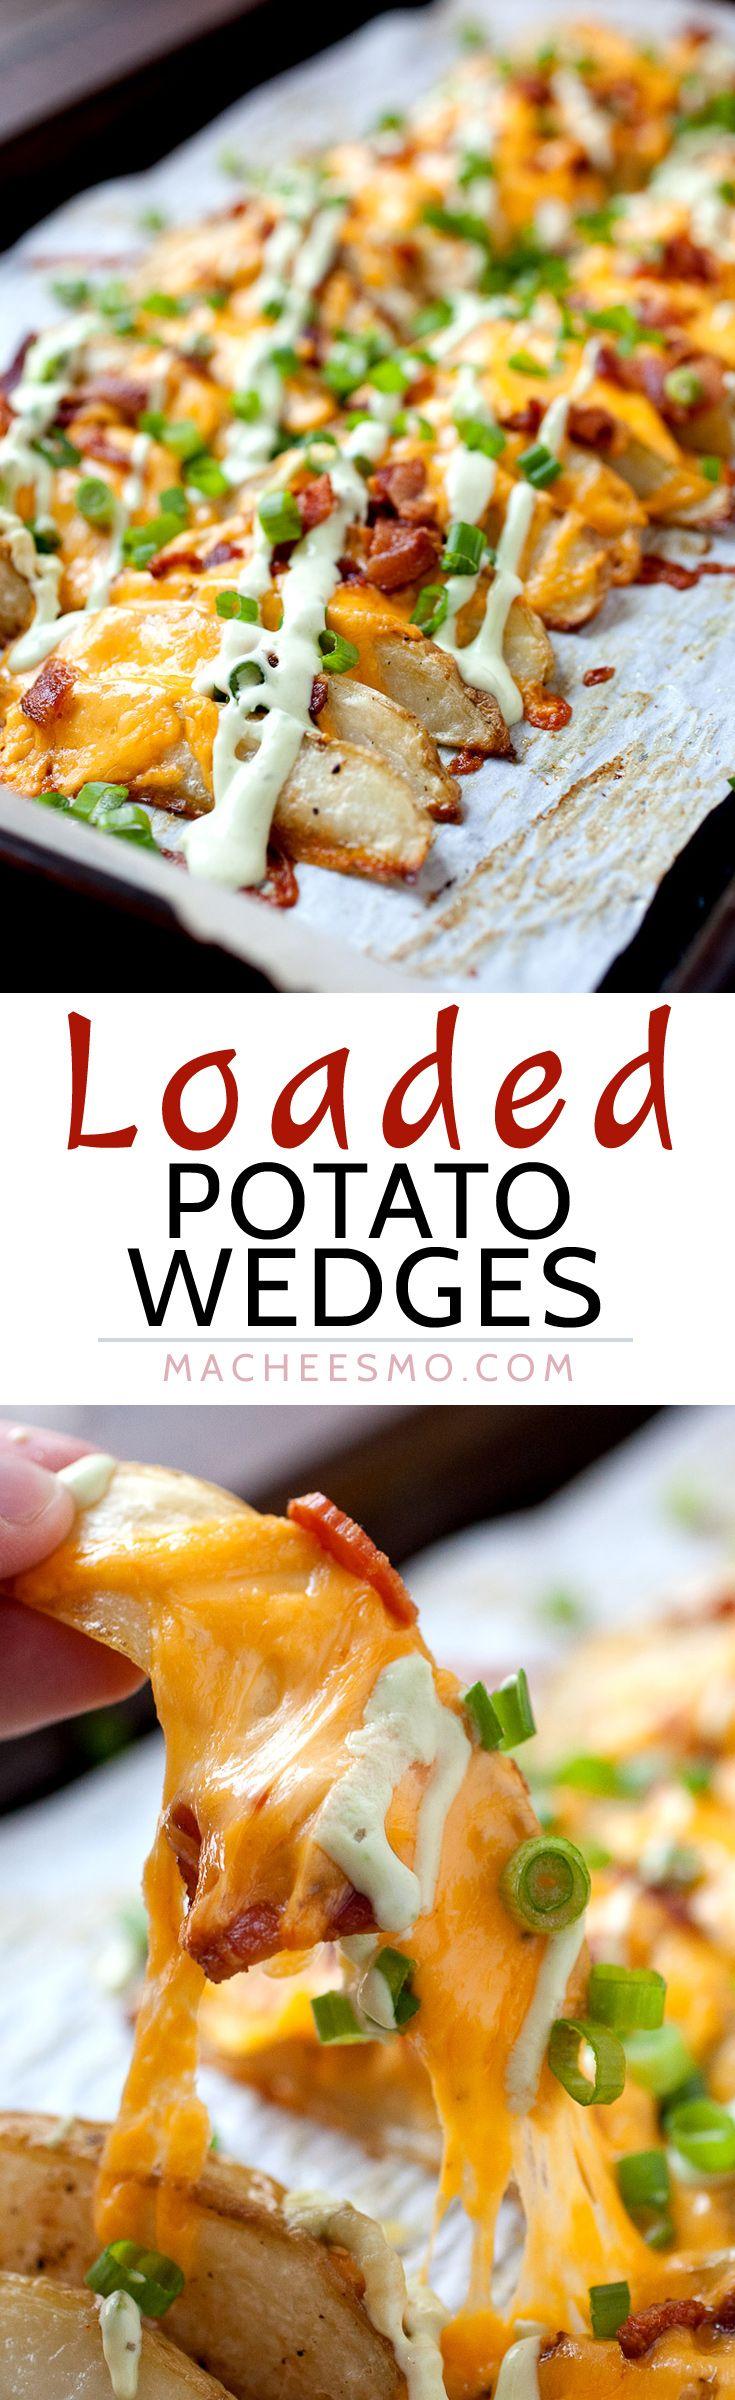 Loaded potato Wedges - Baked and Crispy ~ Macheesmo